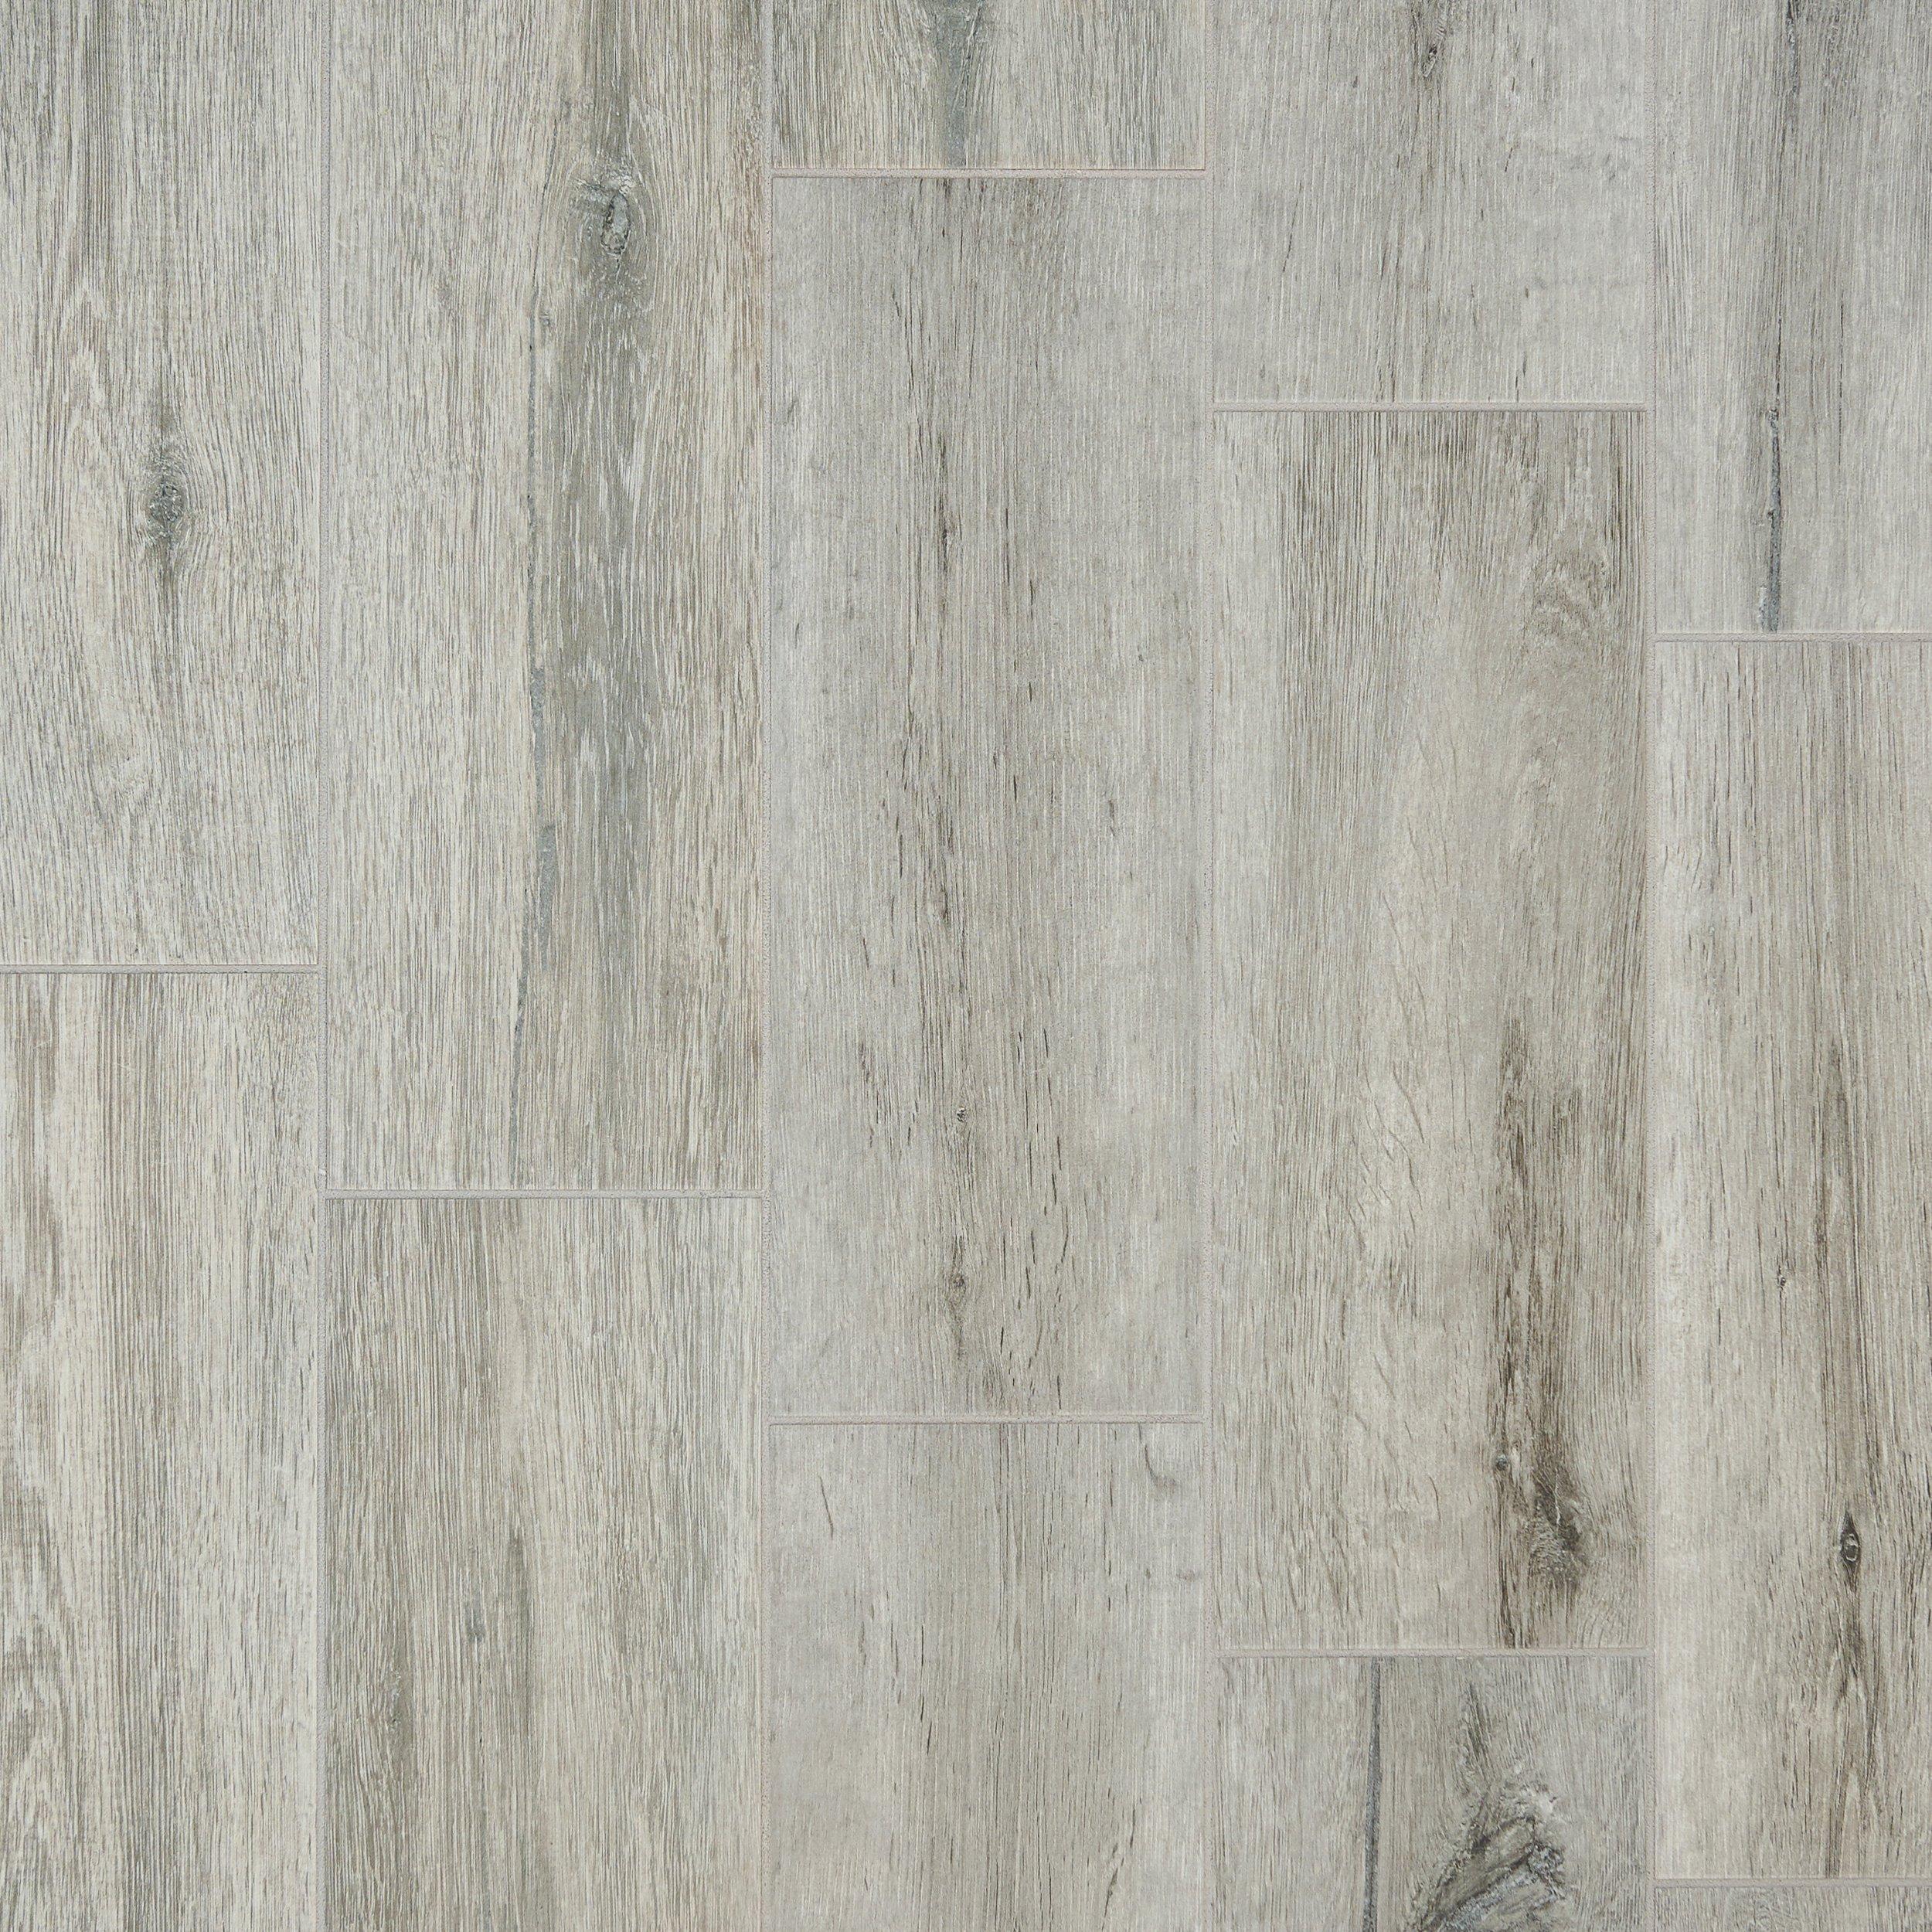 Carson Gray Wood Plank Ceramic Tile 6 X 24 100512250 Floor And